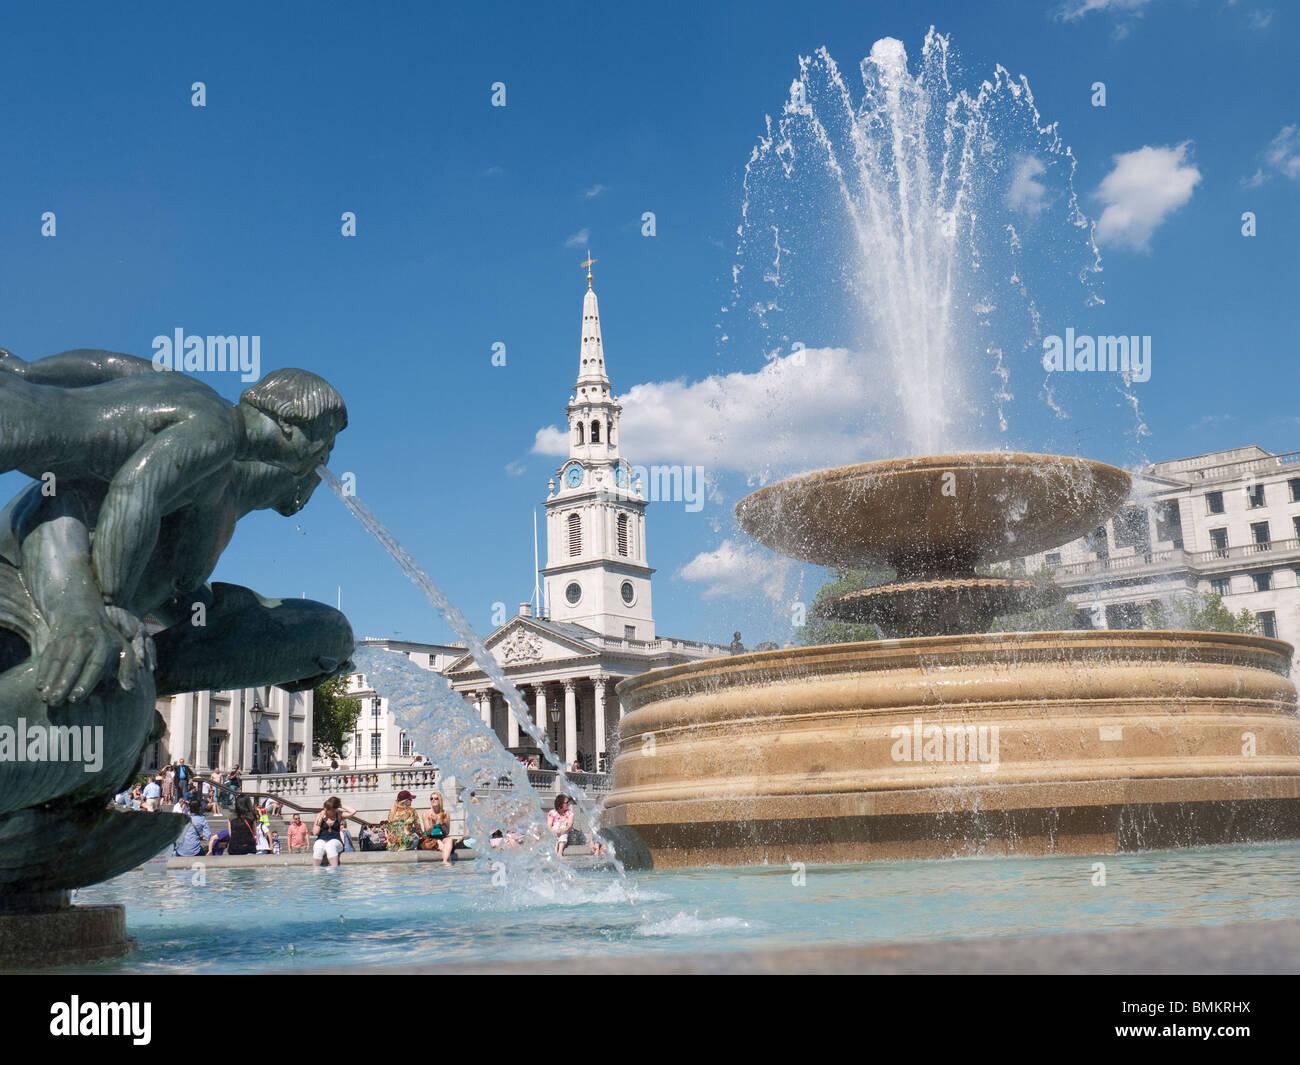 Trafalgar Square and St Martins Church, London - Stock Image